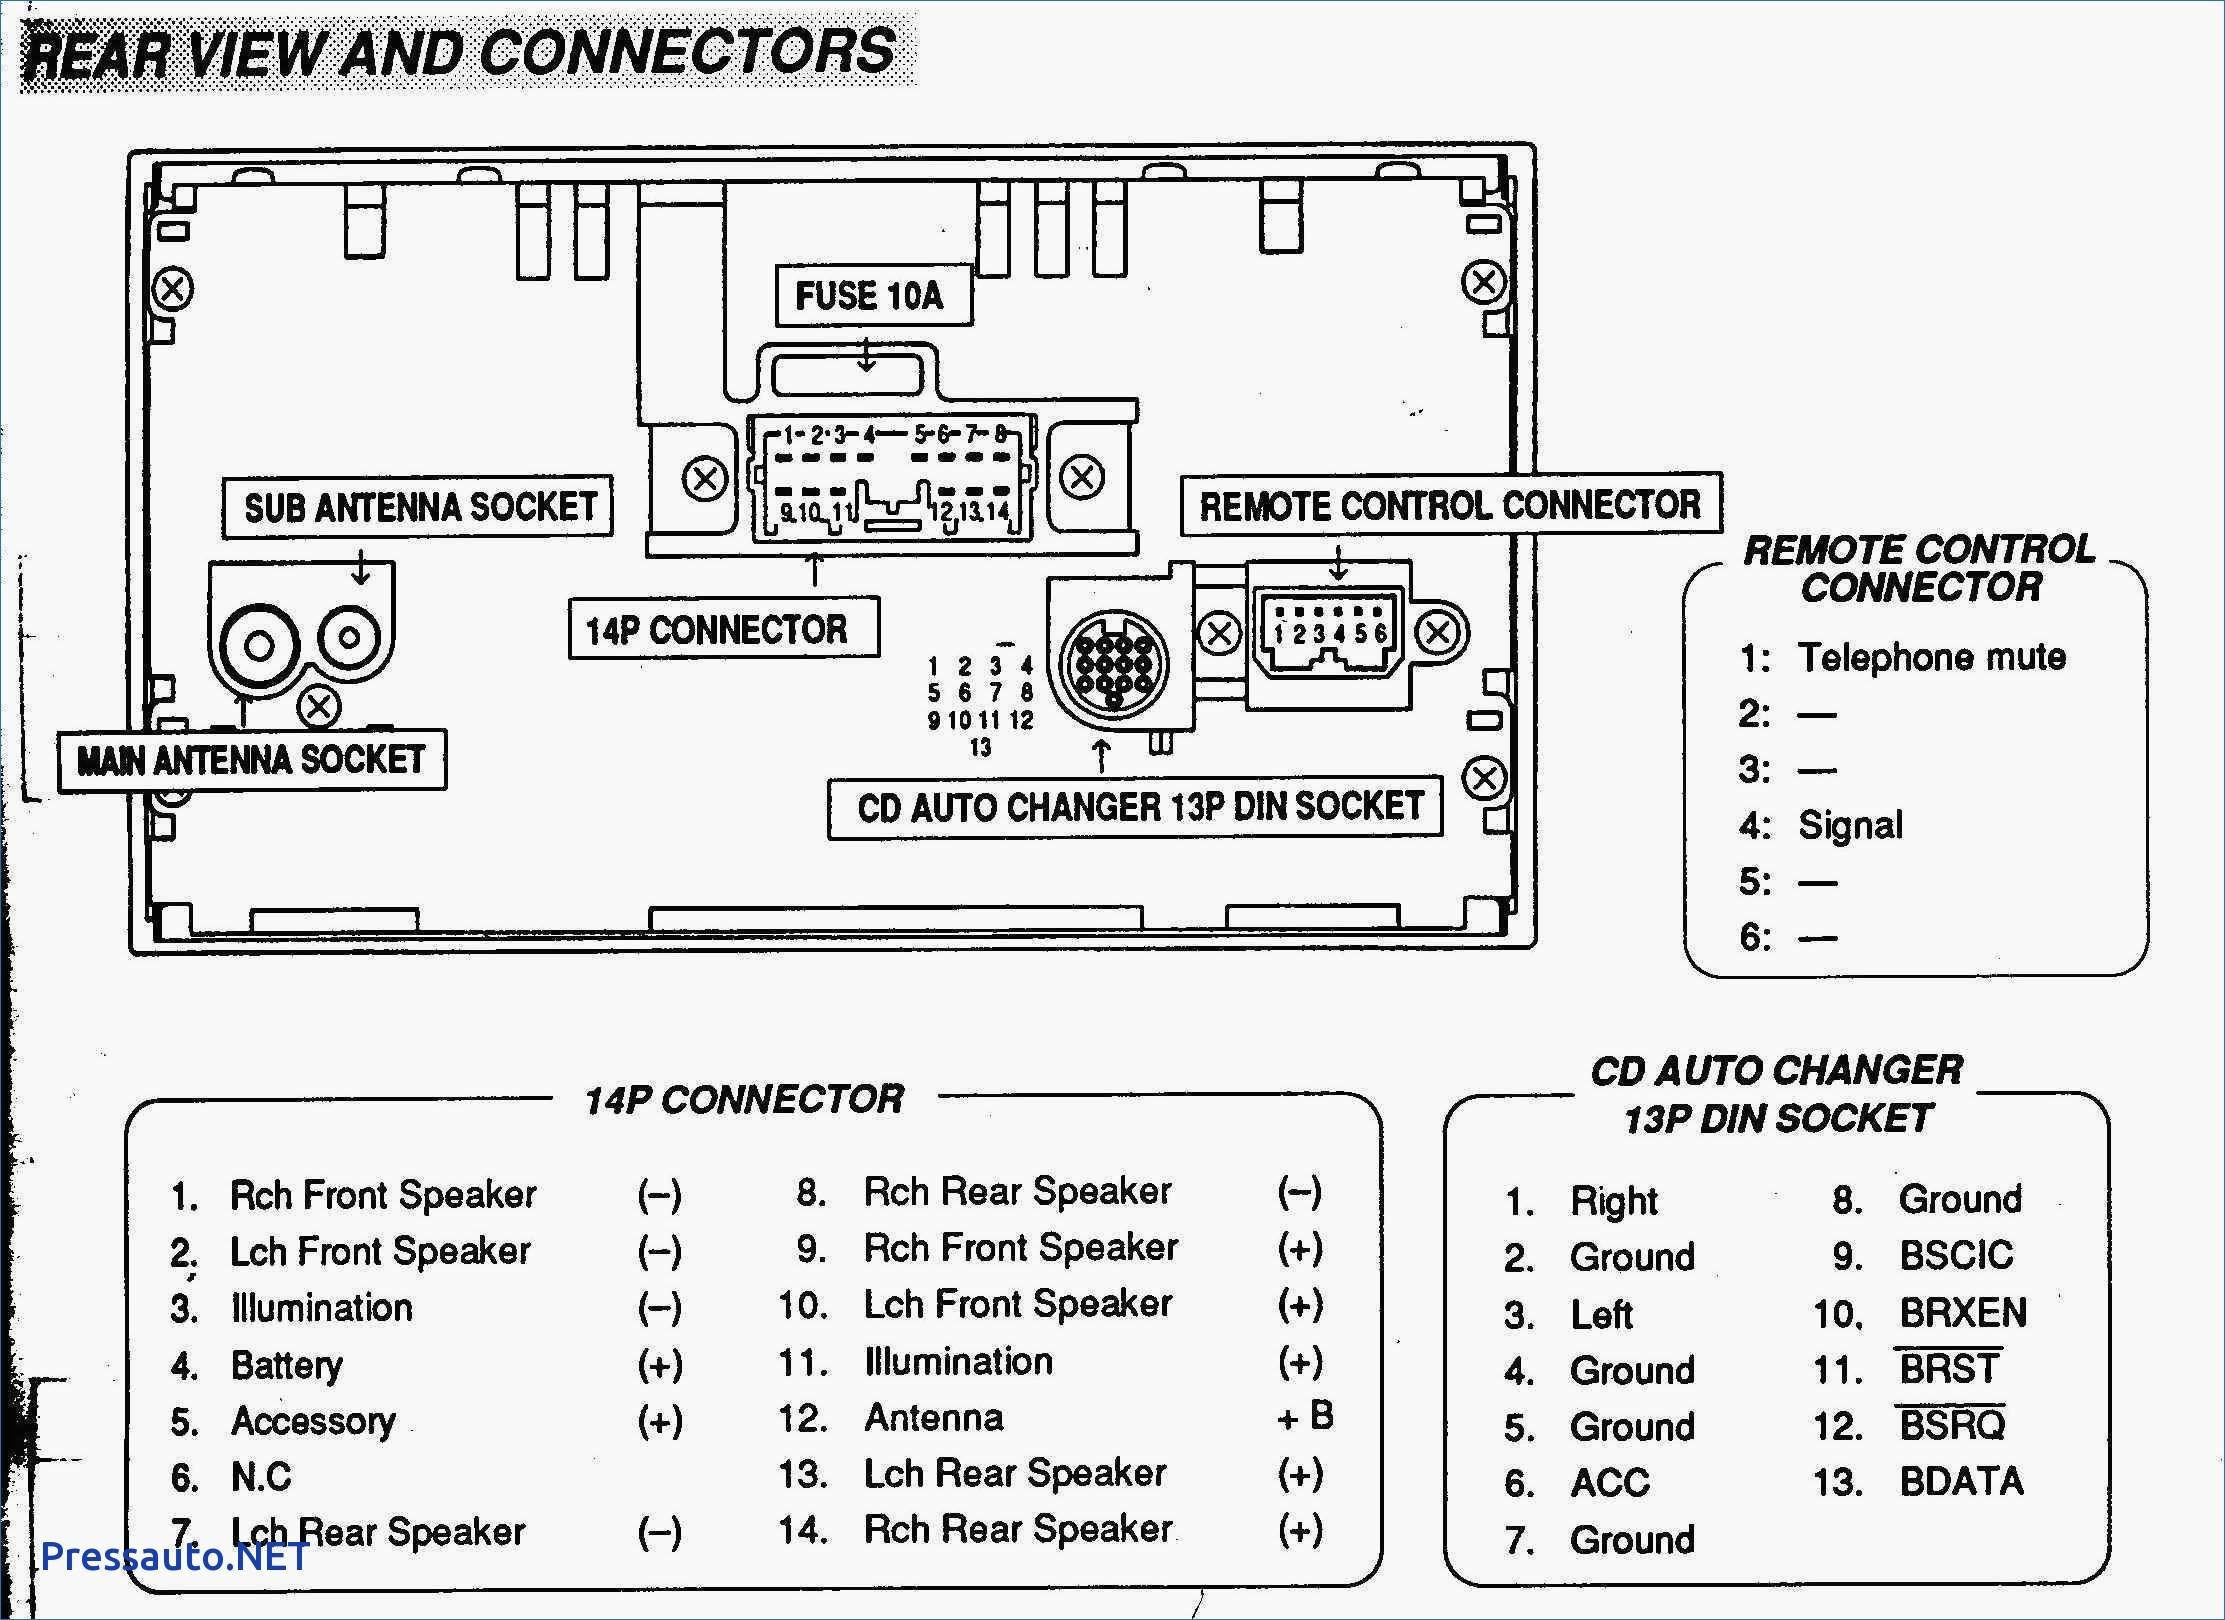 09 mitsubishi lancer fuse diagram wiring diagram new 2014 Corolla Radio